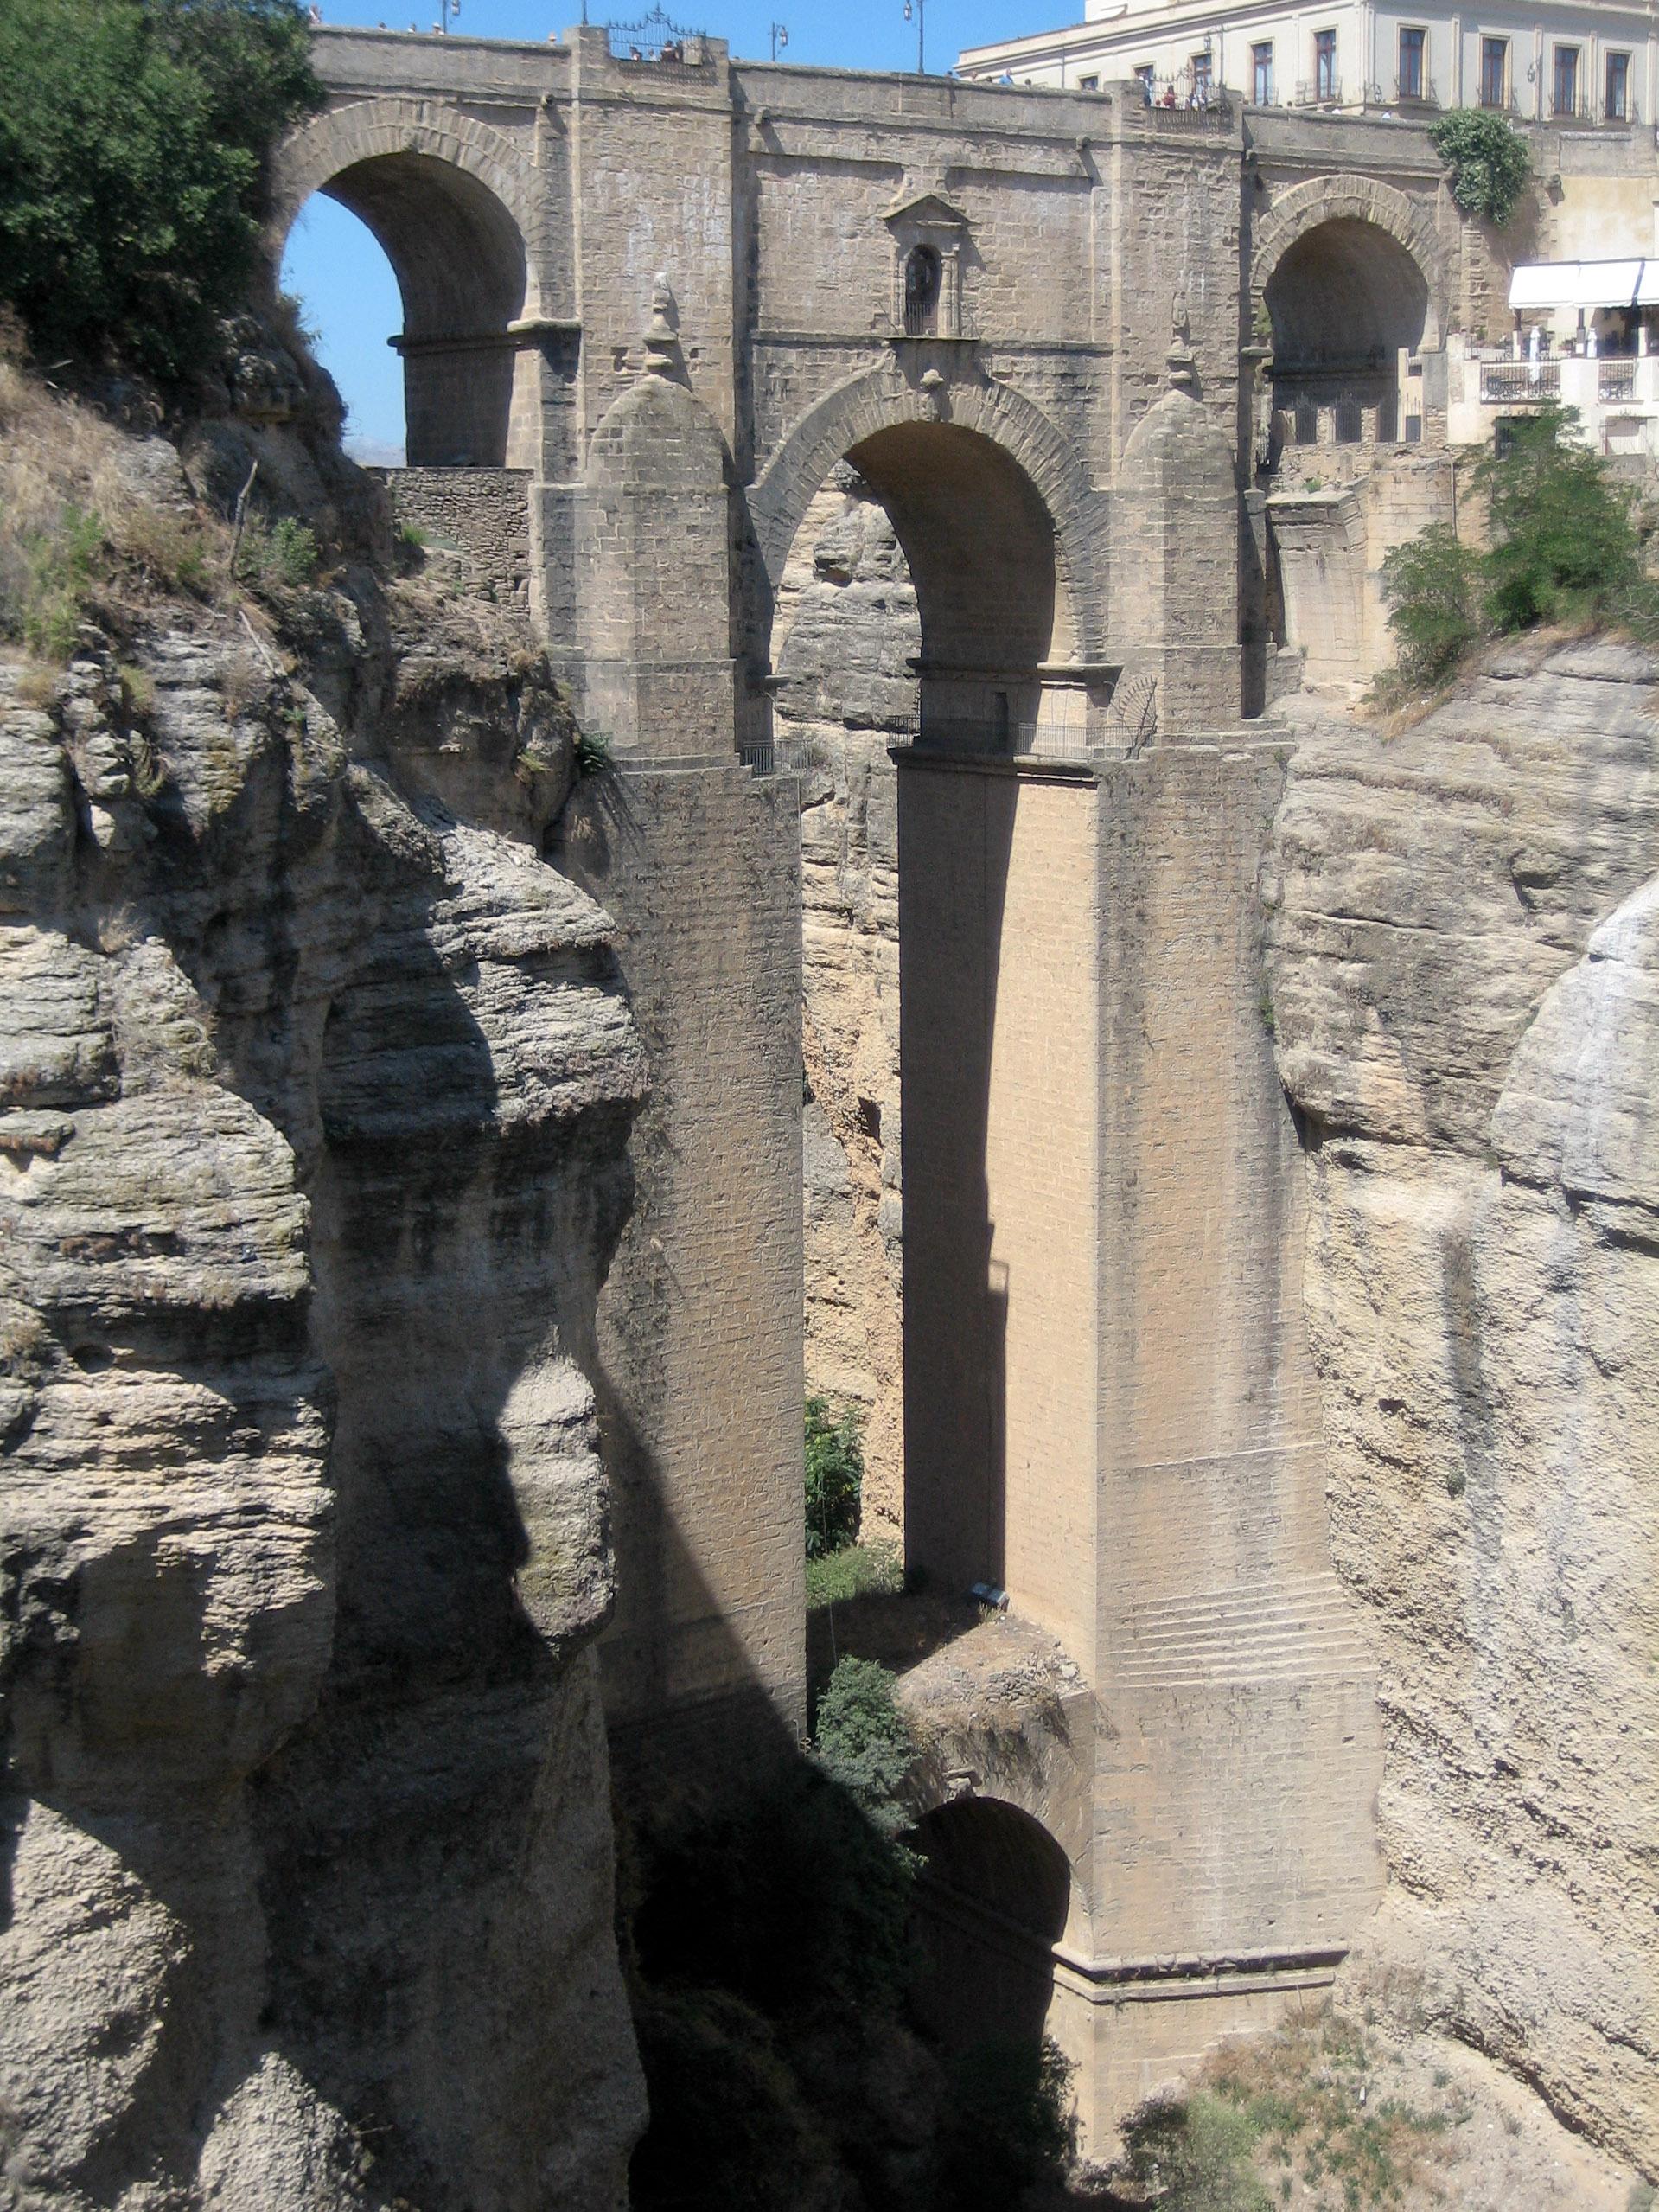 Arhitektura koja spaja ljude - Mostovi Punte_Nuevo_Bridge,_Ronda_-_Spain